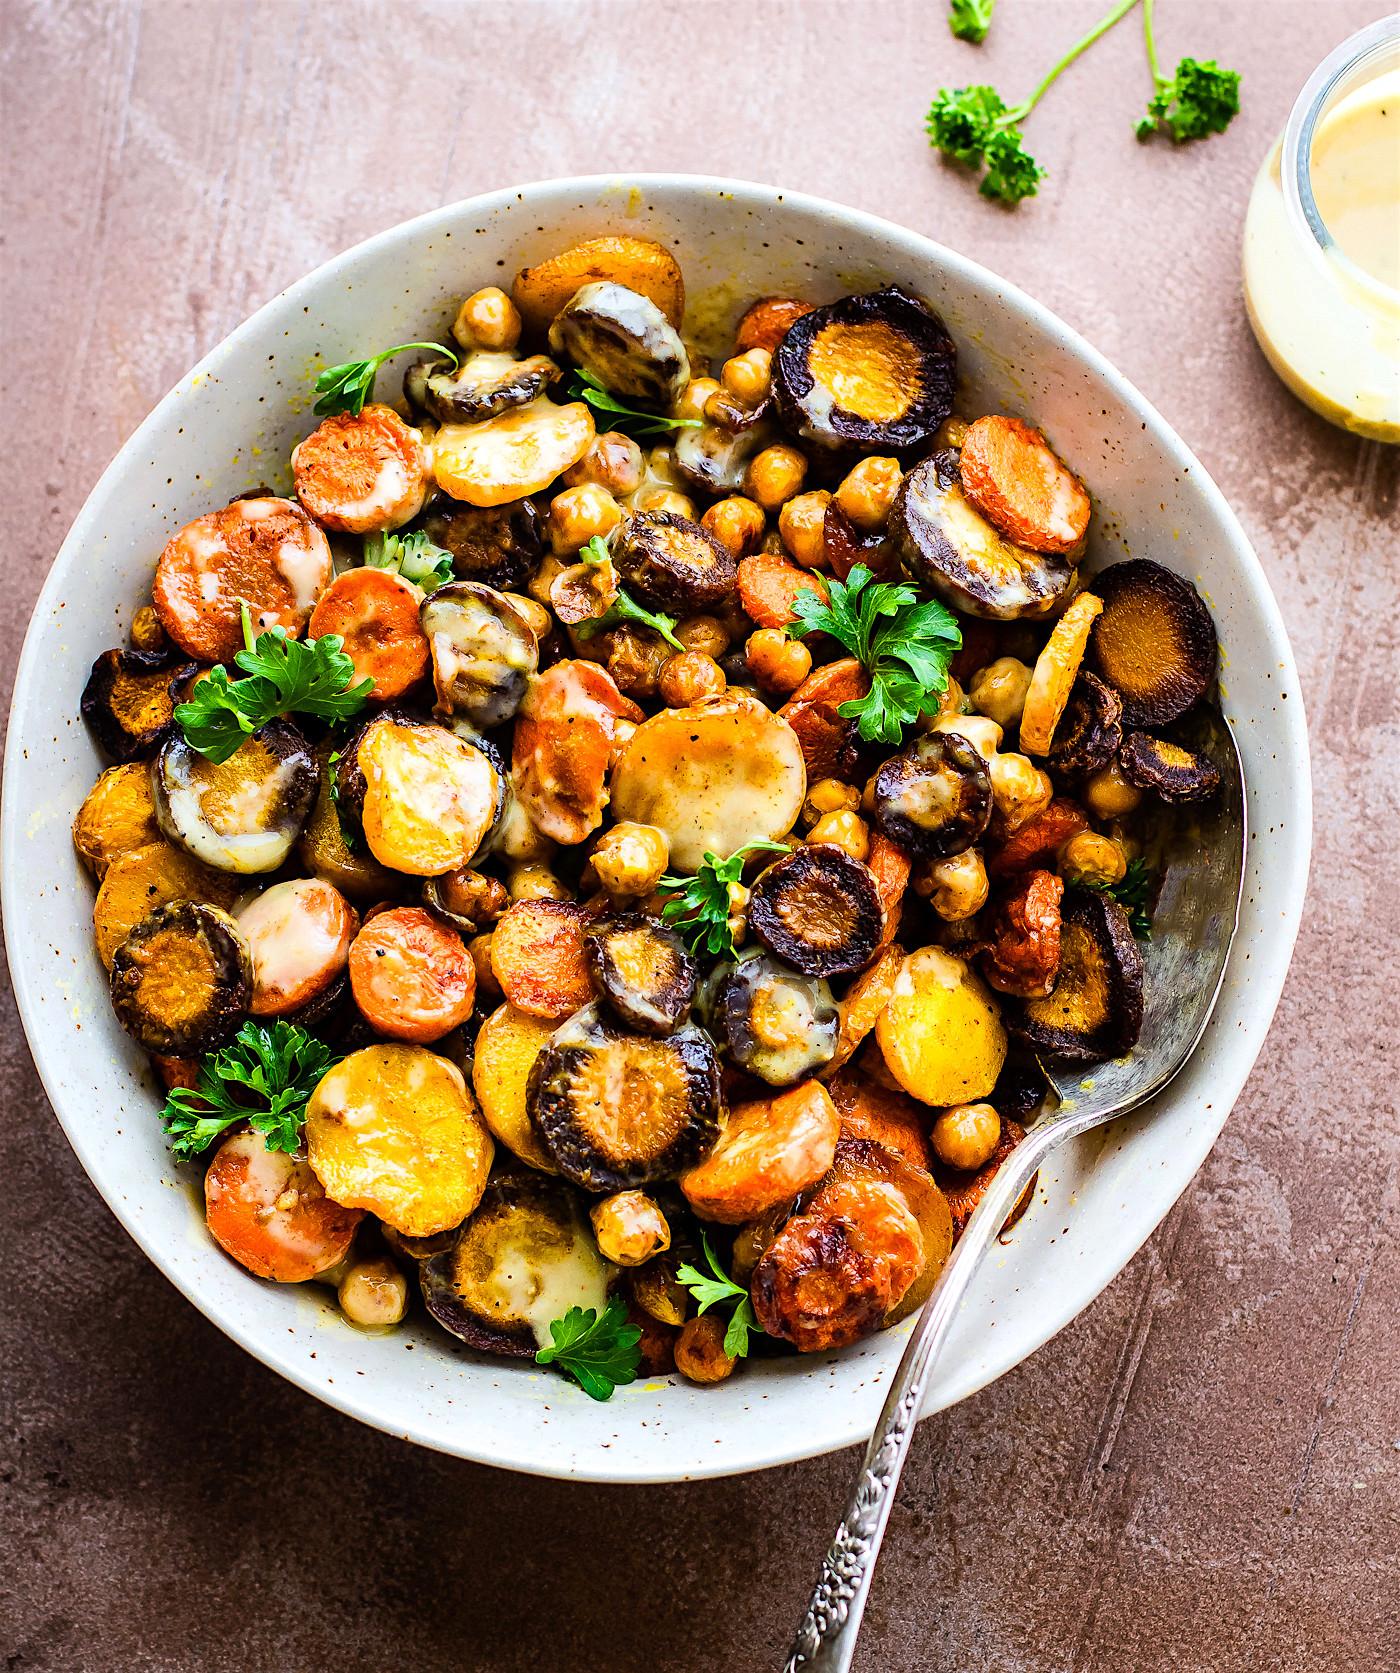 Carrot Recipes Vegetarian  Turmeric Roasted Chickpea Rainbow Carrot Salad Vegan